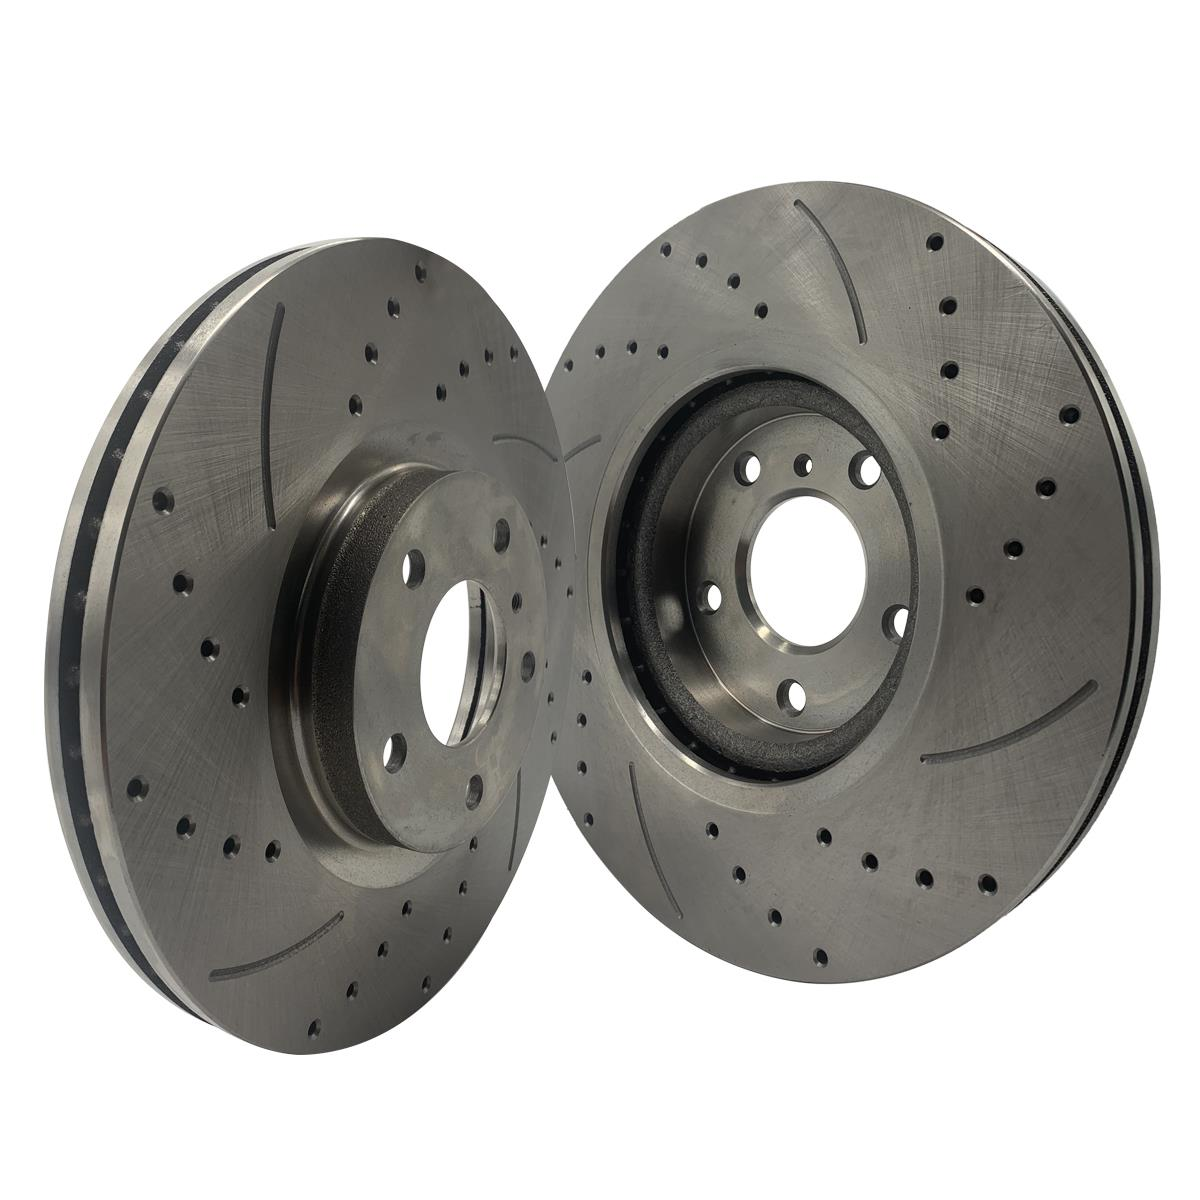 FRONT SET BRAKENETIC SPORT Cross DRILLED Brake Disc Rotors BNS42075.CD